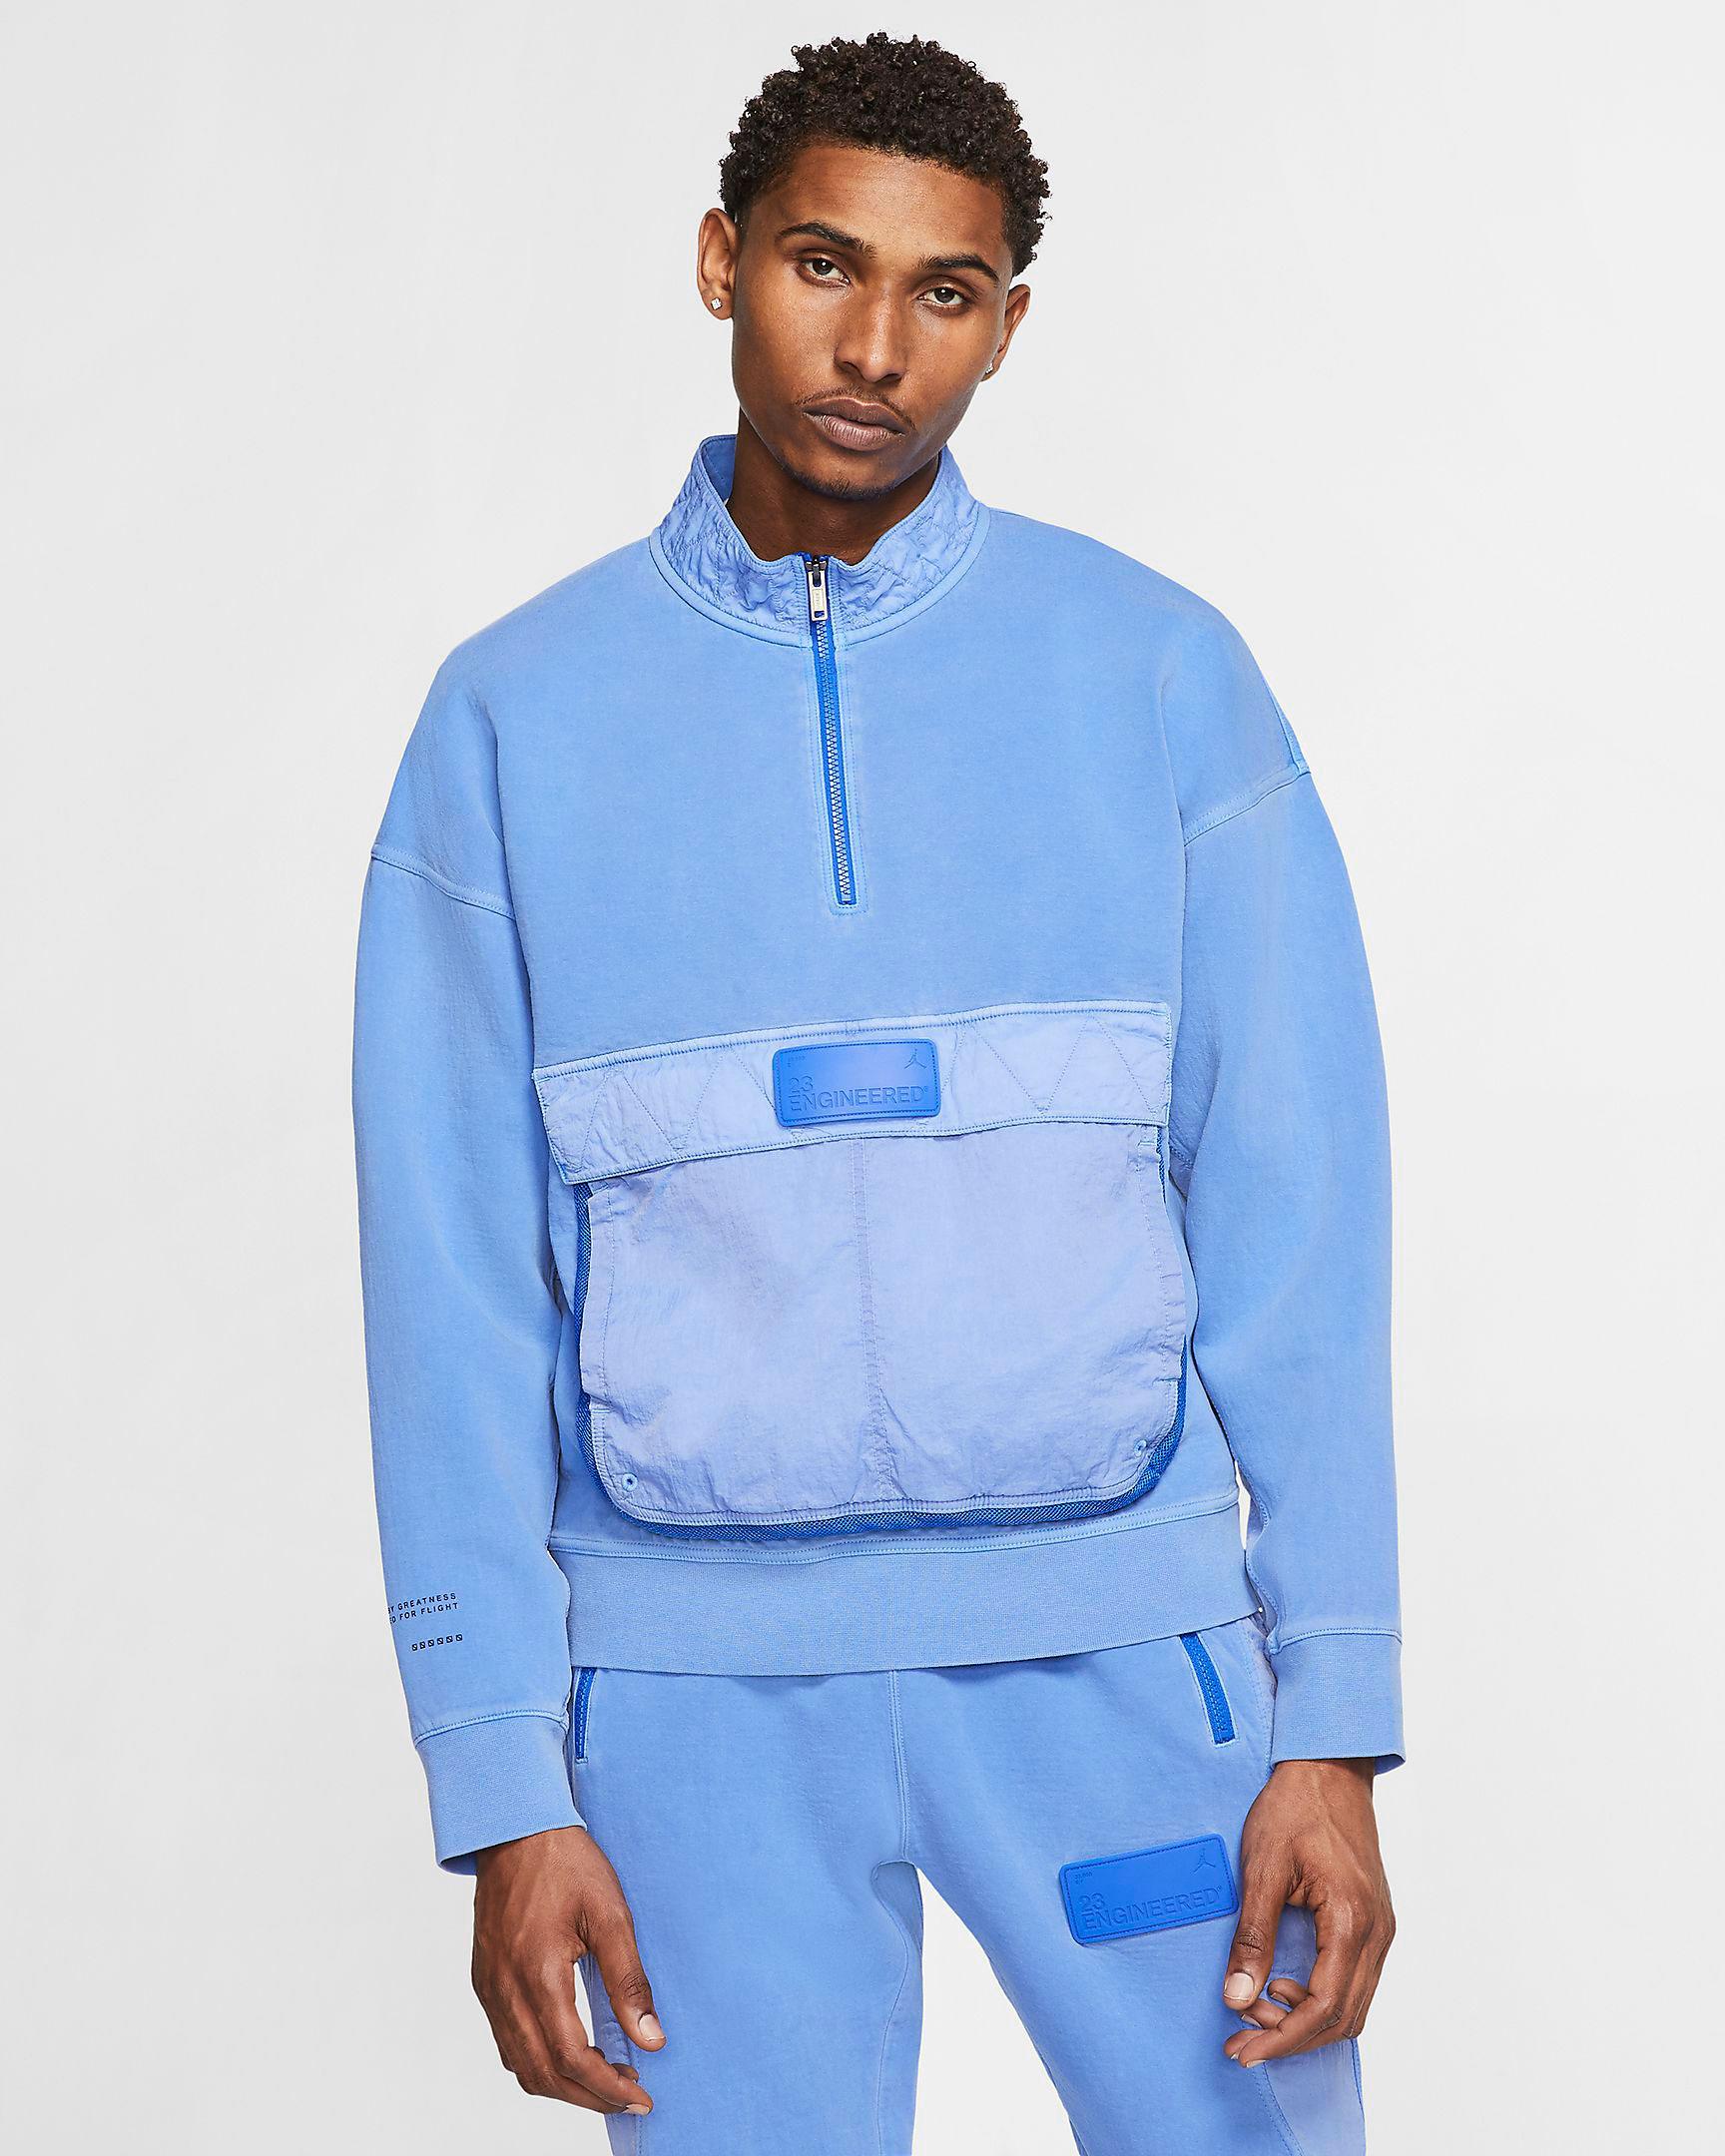 jordan-aerospace-720-lyrical-lemondade-matching-shirt